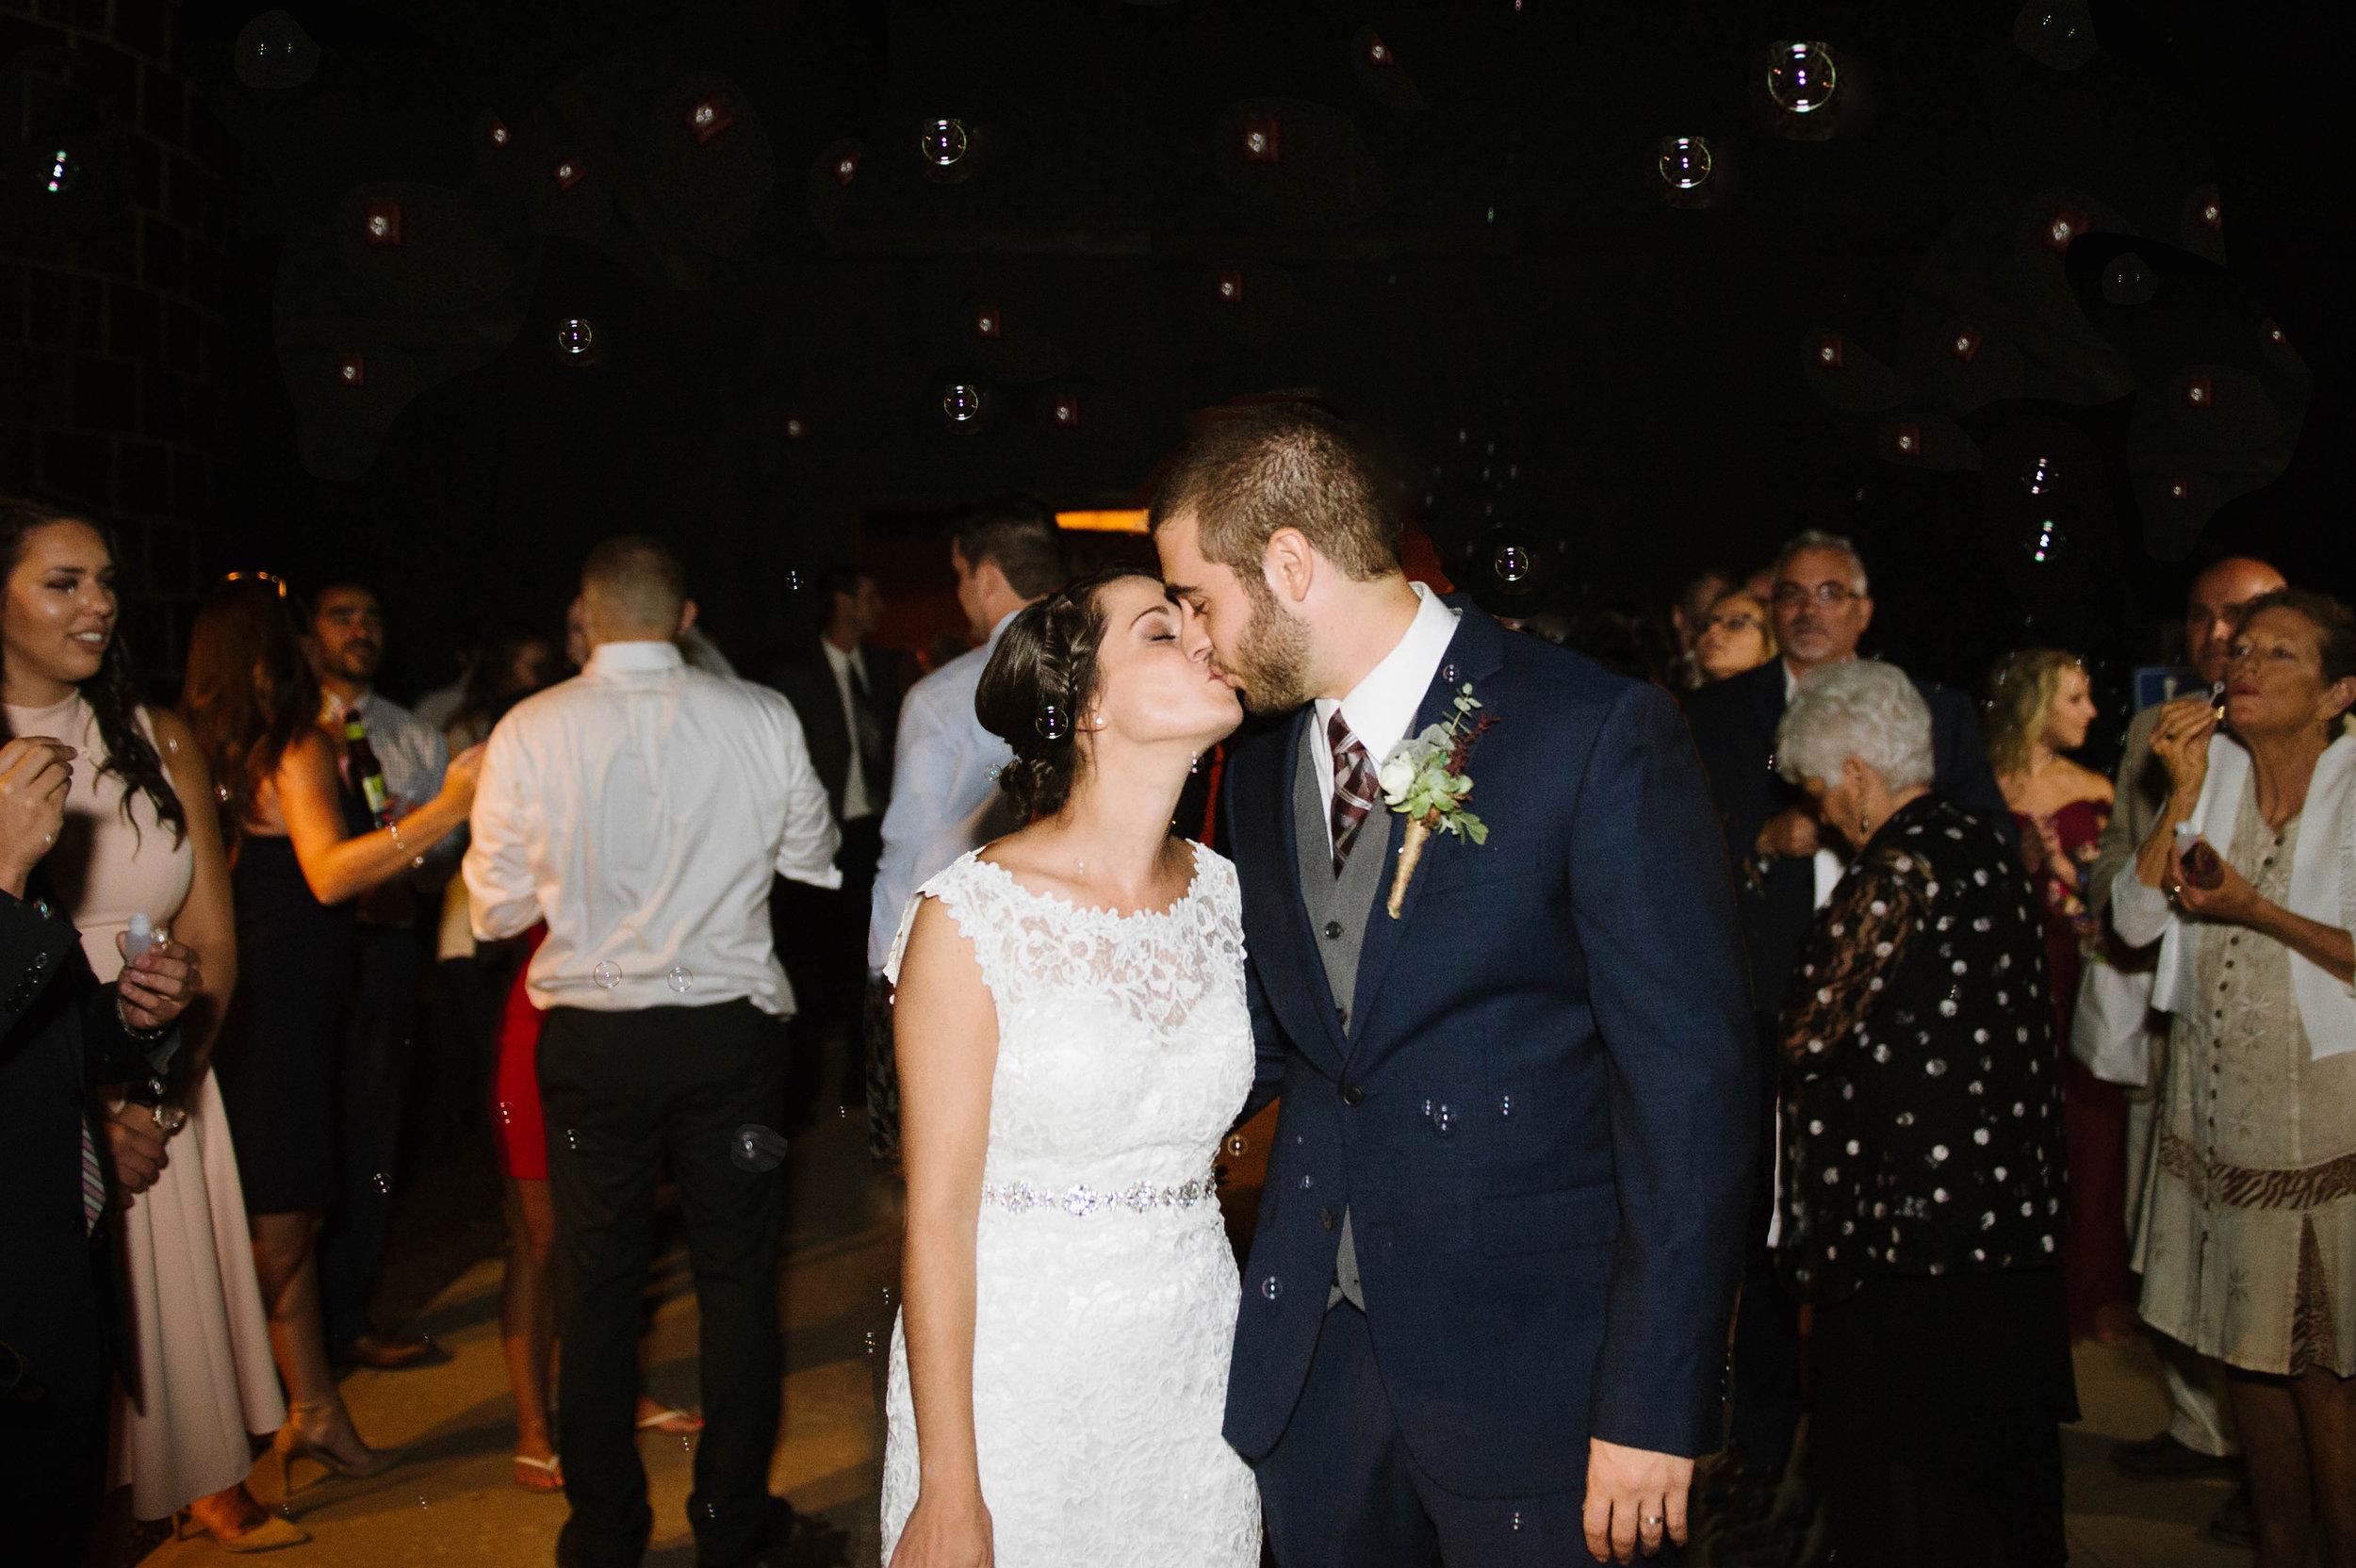 Wedding-Barn-Photography-Massachusetts007.jpg